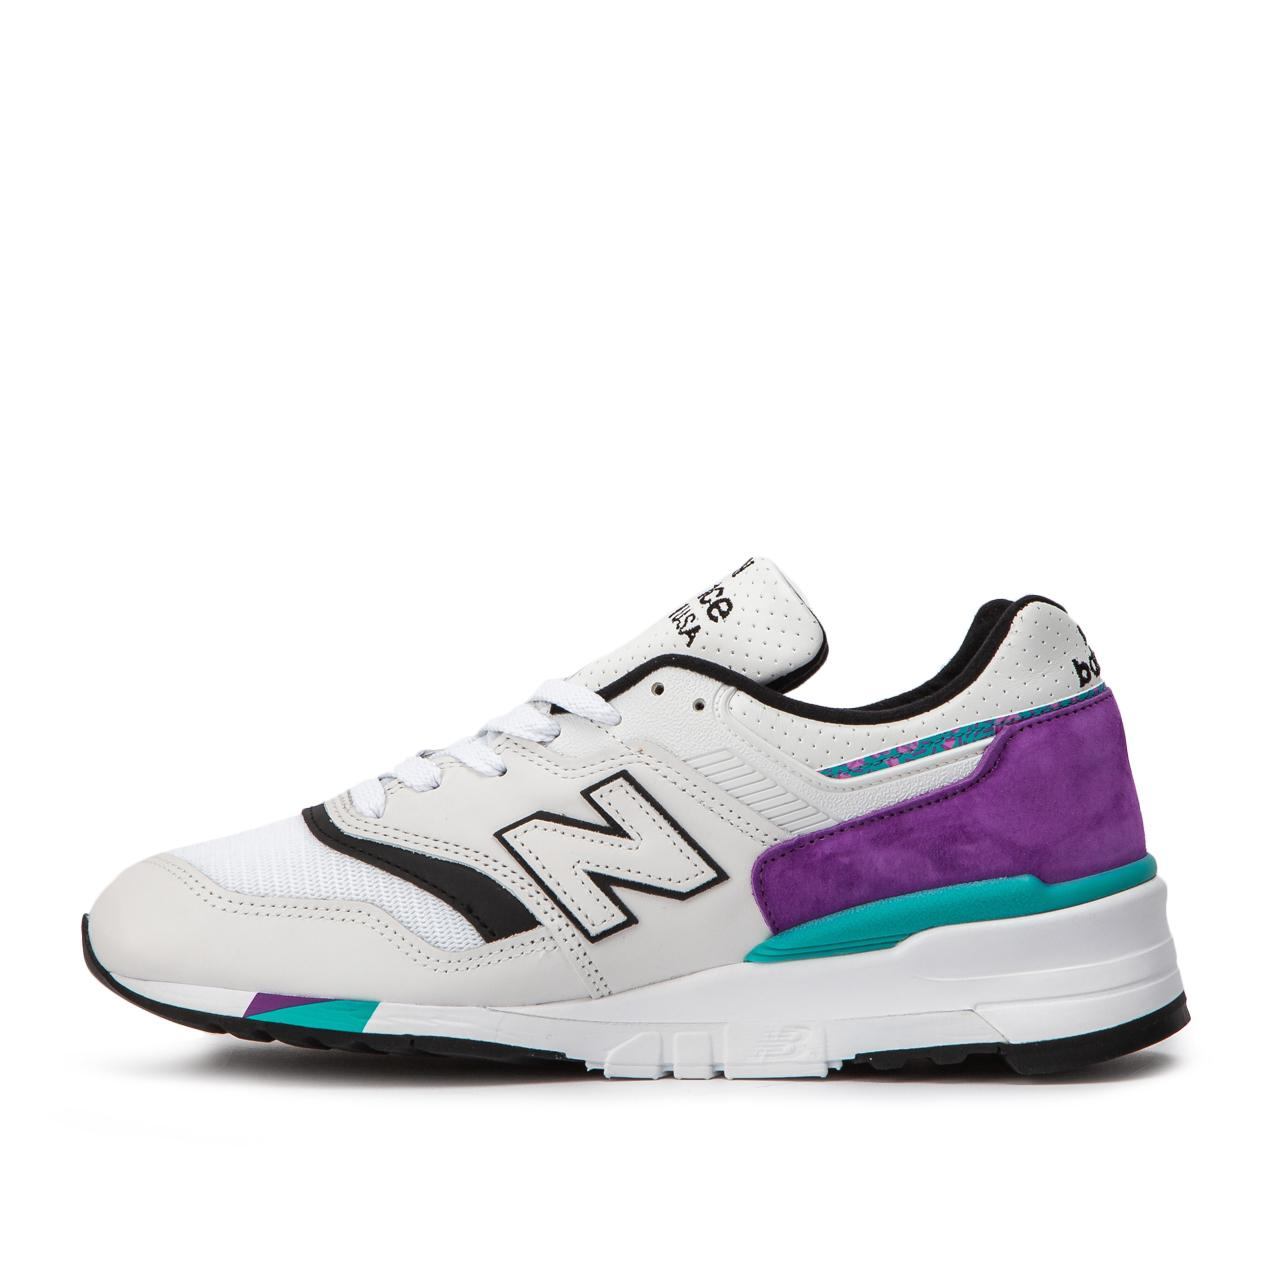 new balance 997 wea